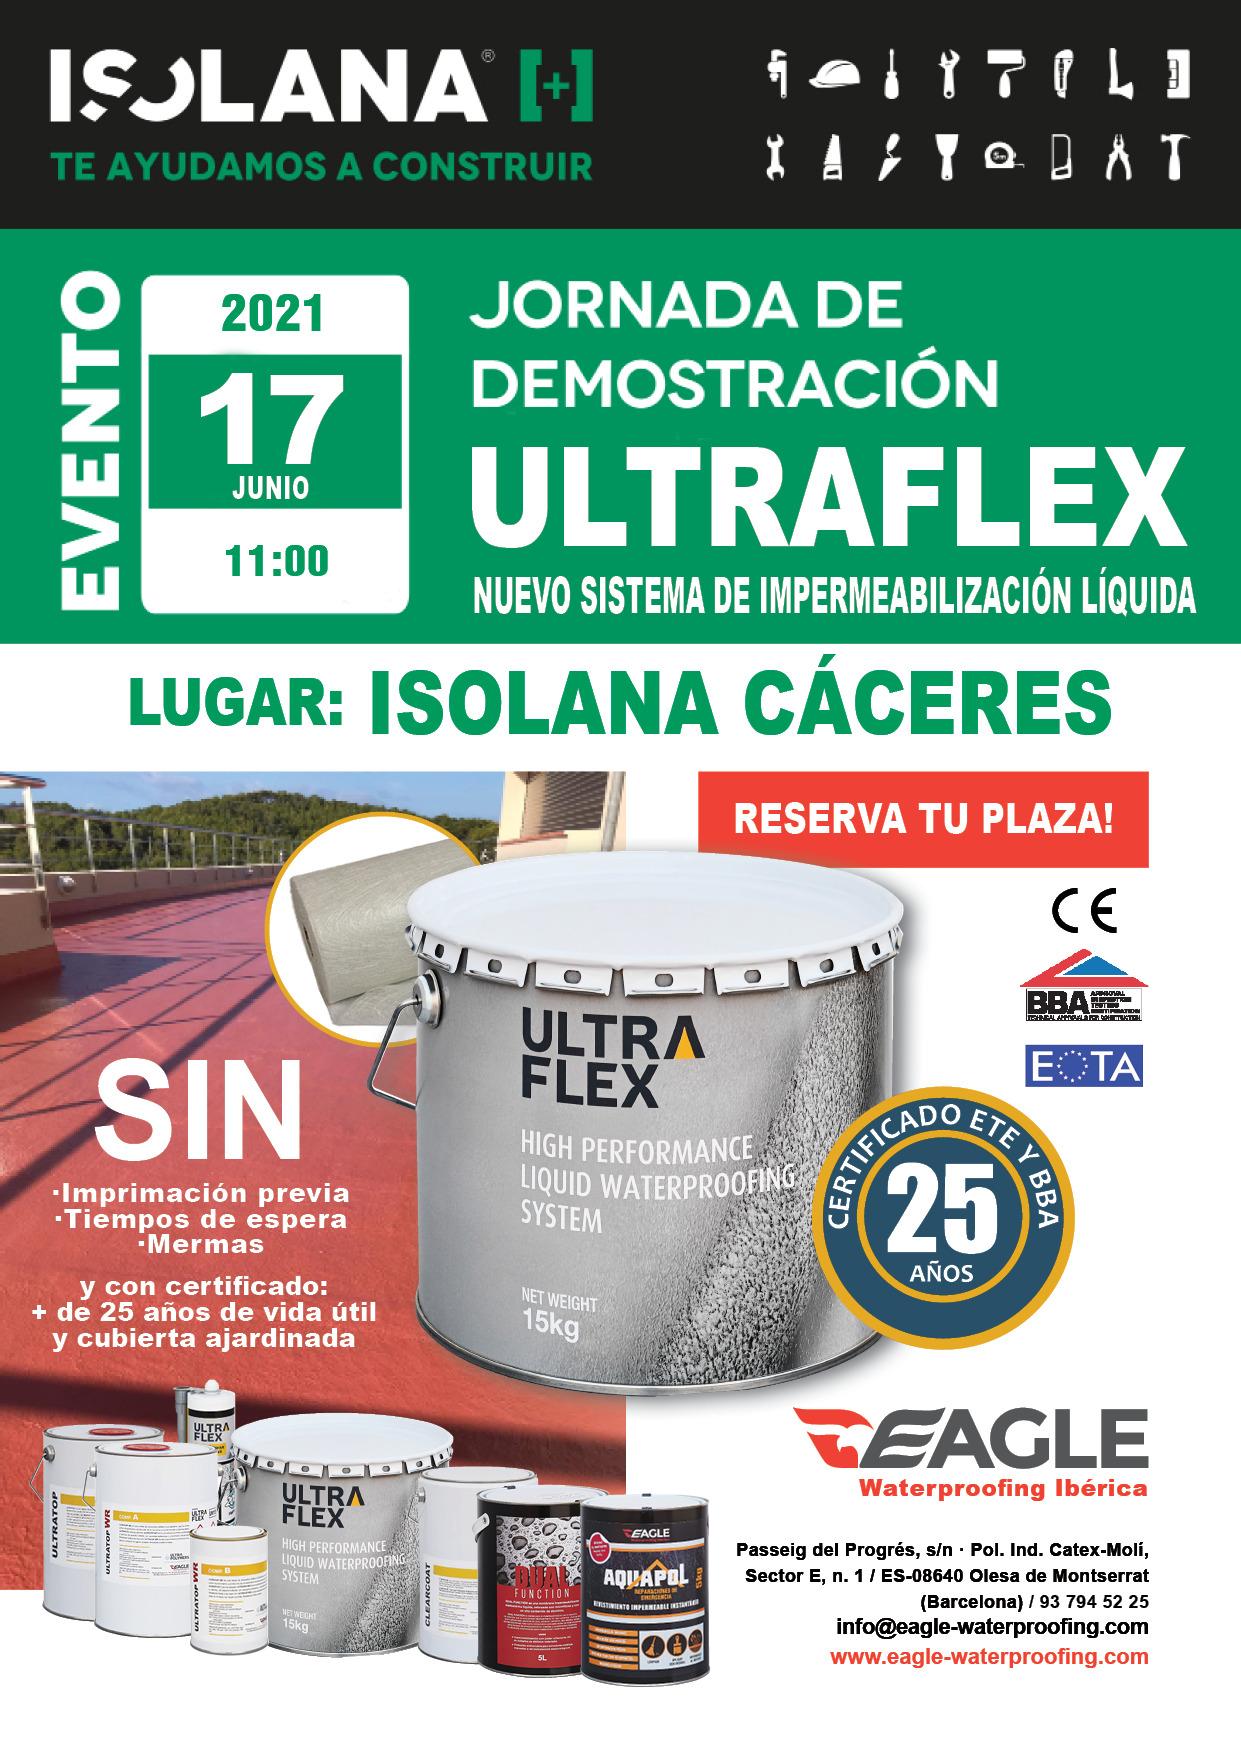 Training Day de Ultraflex en ISOLANA CÁCERES